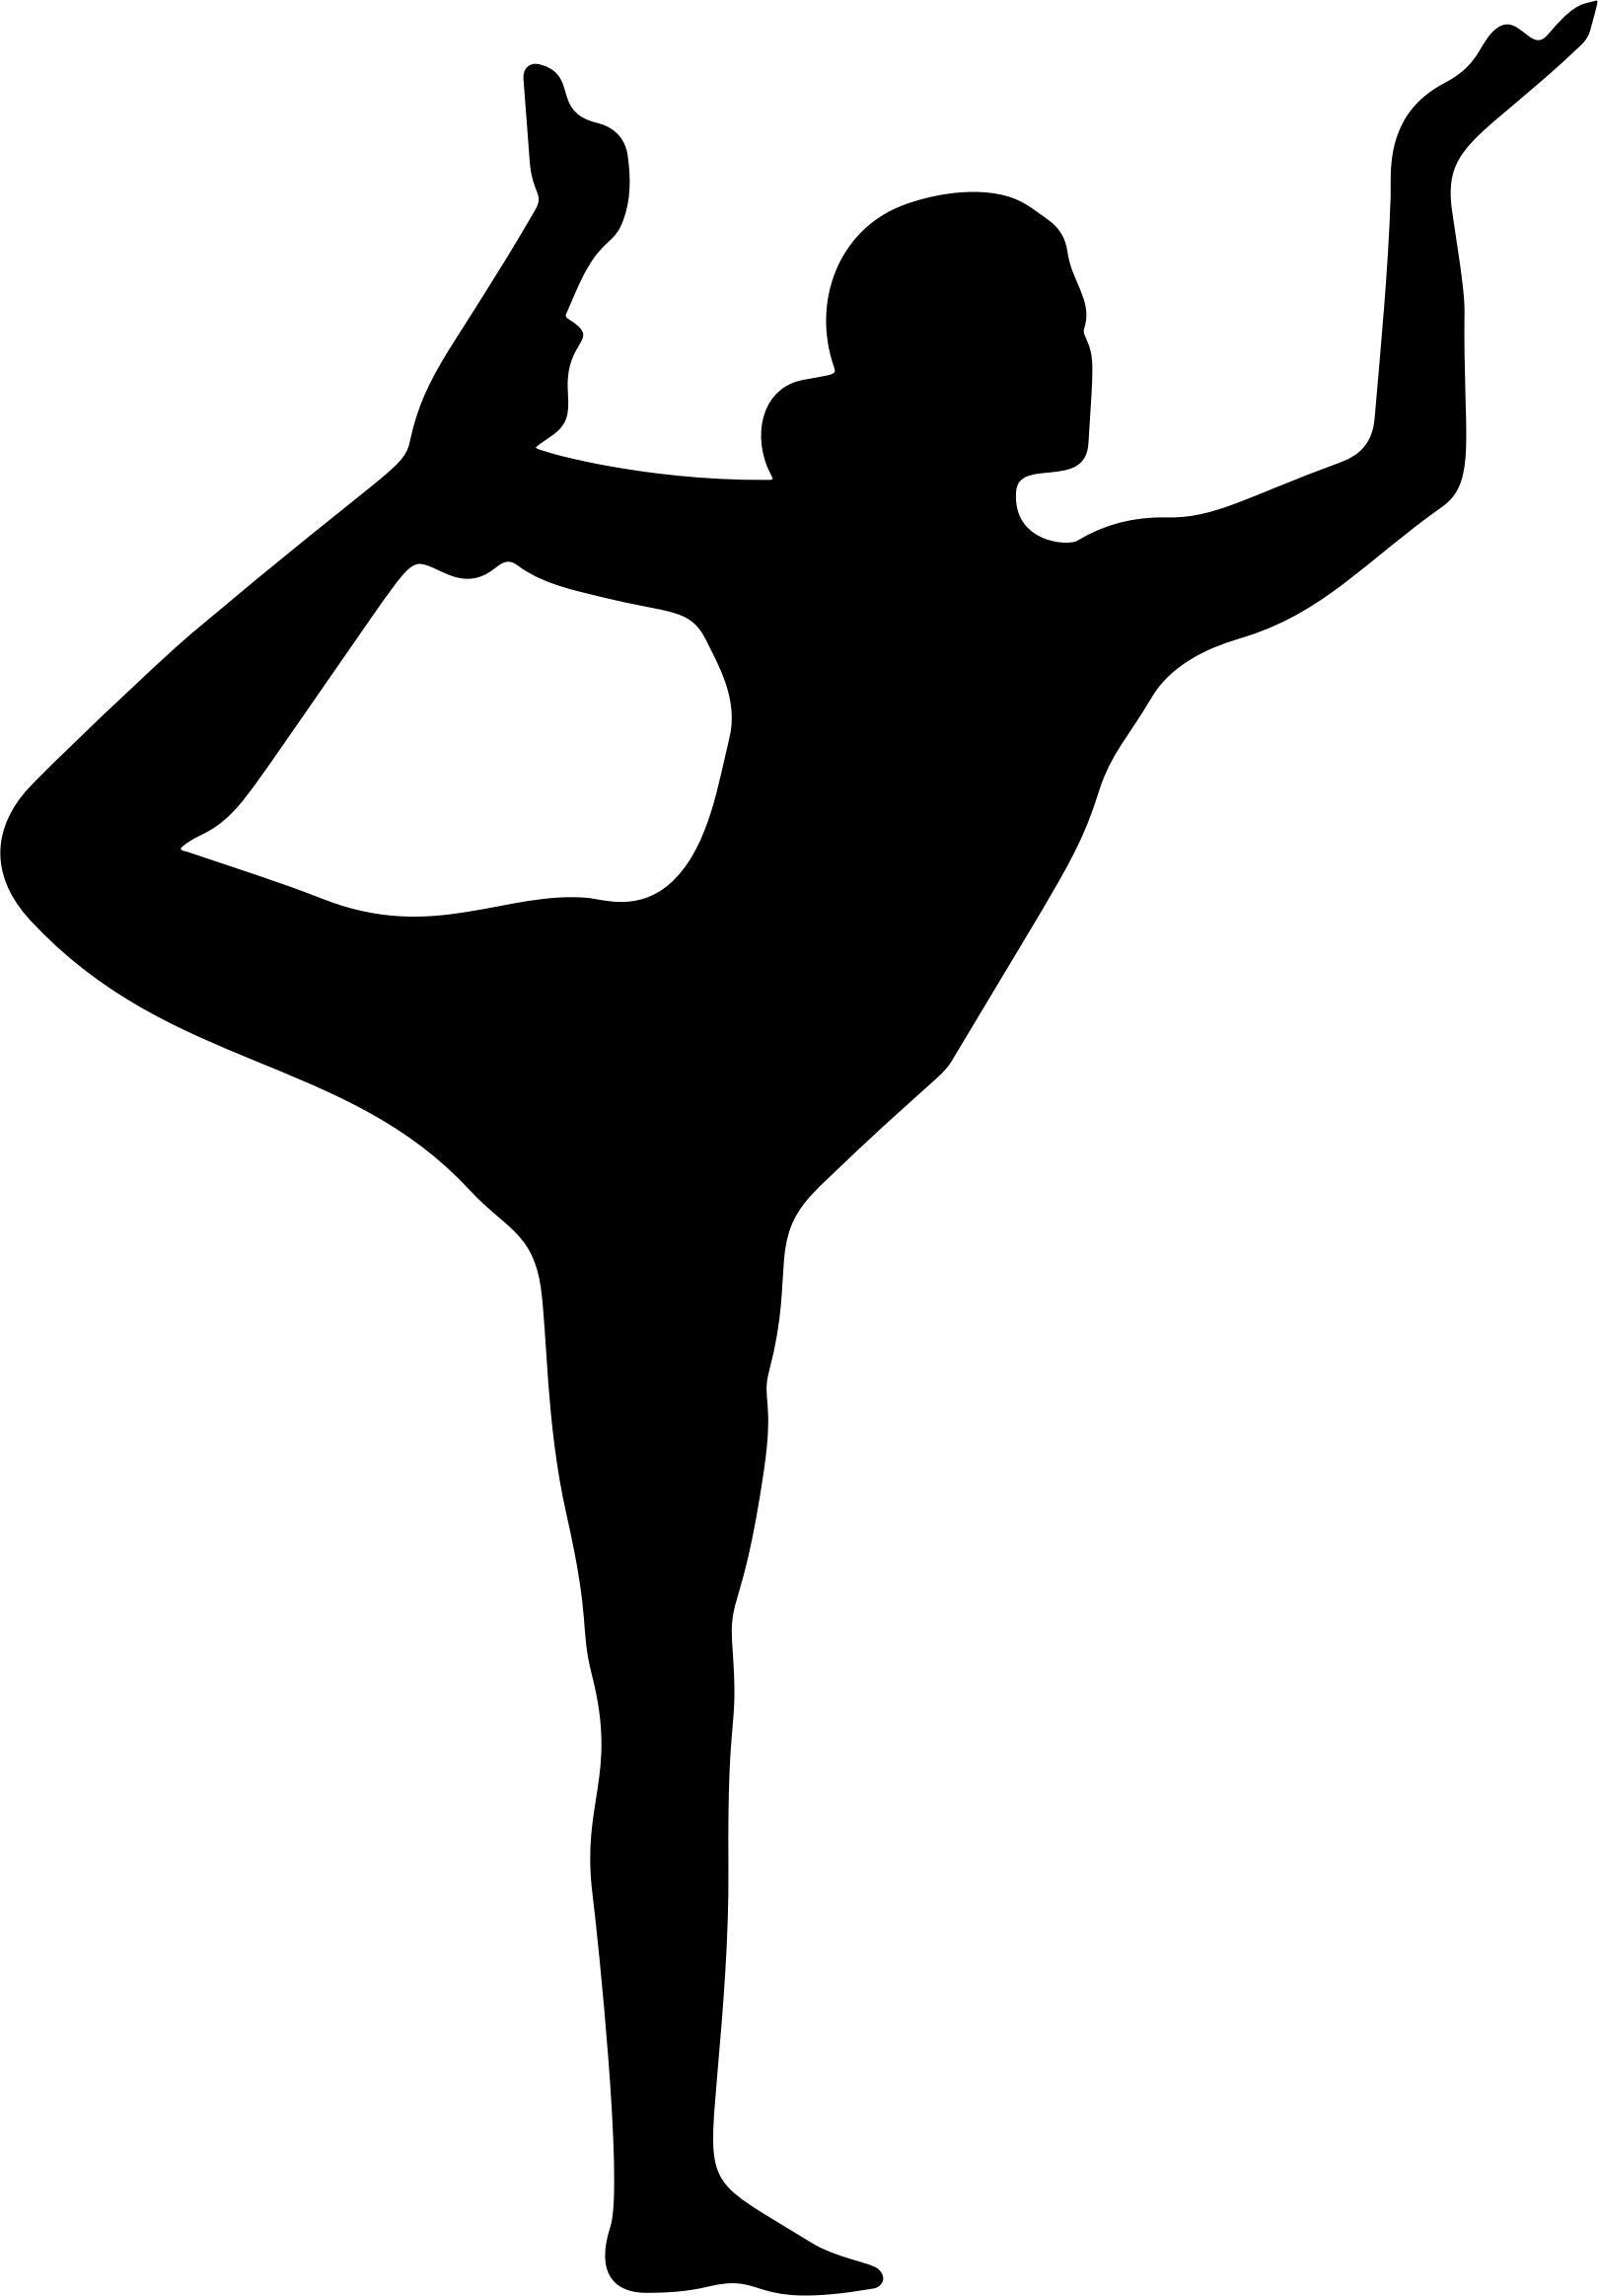 1620x2327 Female Yoga Pose Silhouette 18 Icons Png